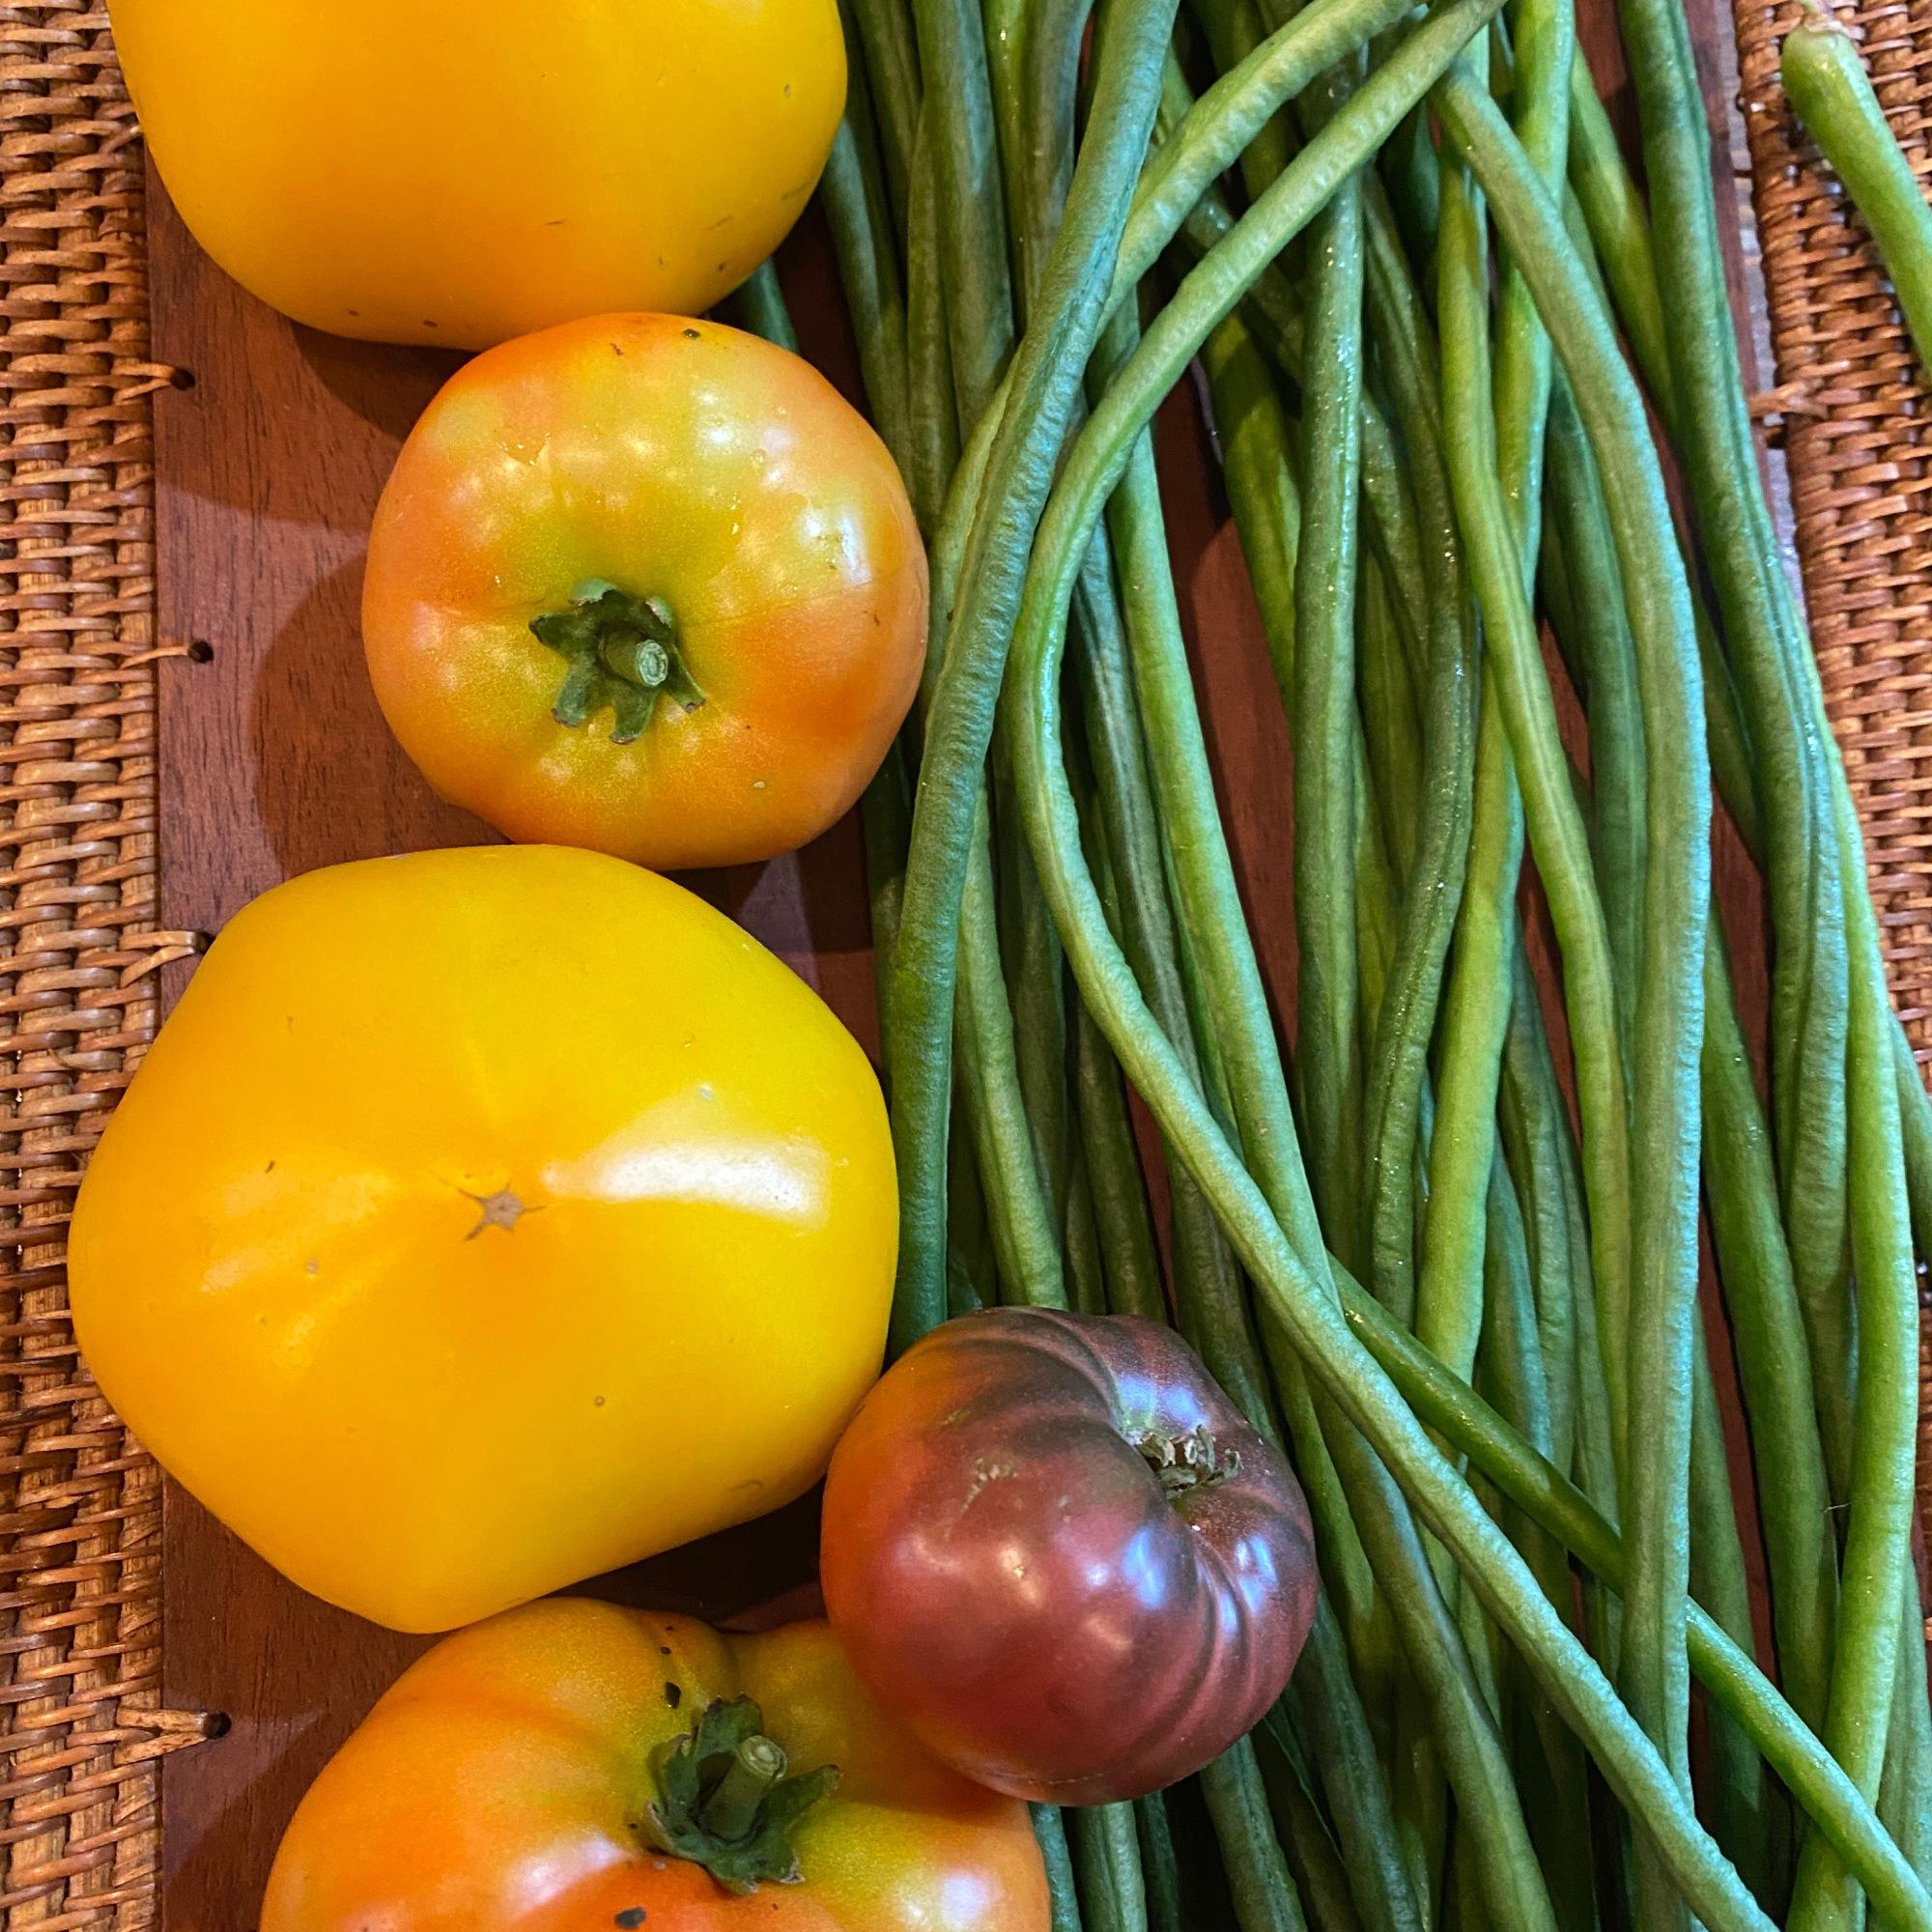 Golden Sunshine Tomatoes, Heirloom Tomatoes and Bora